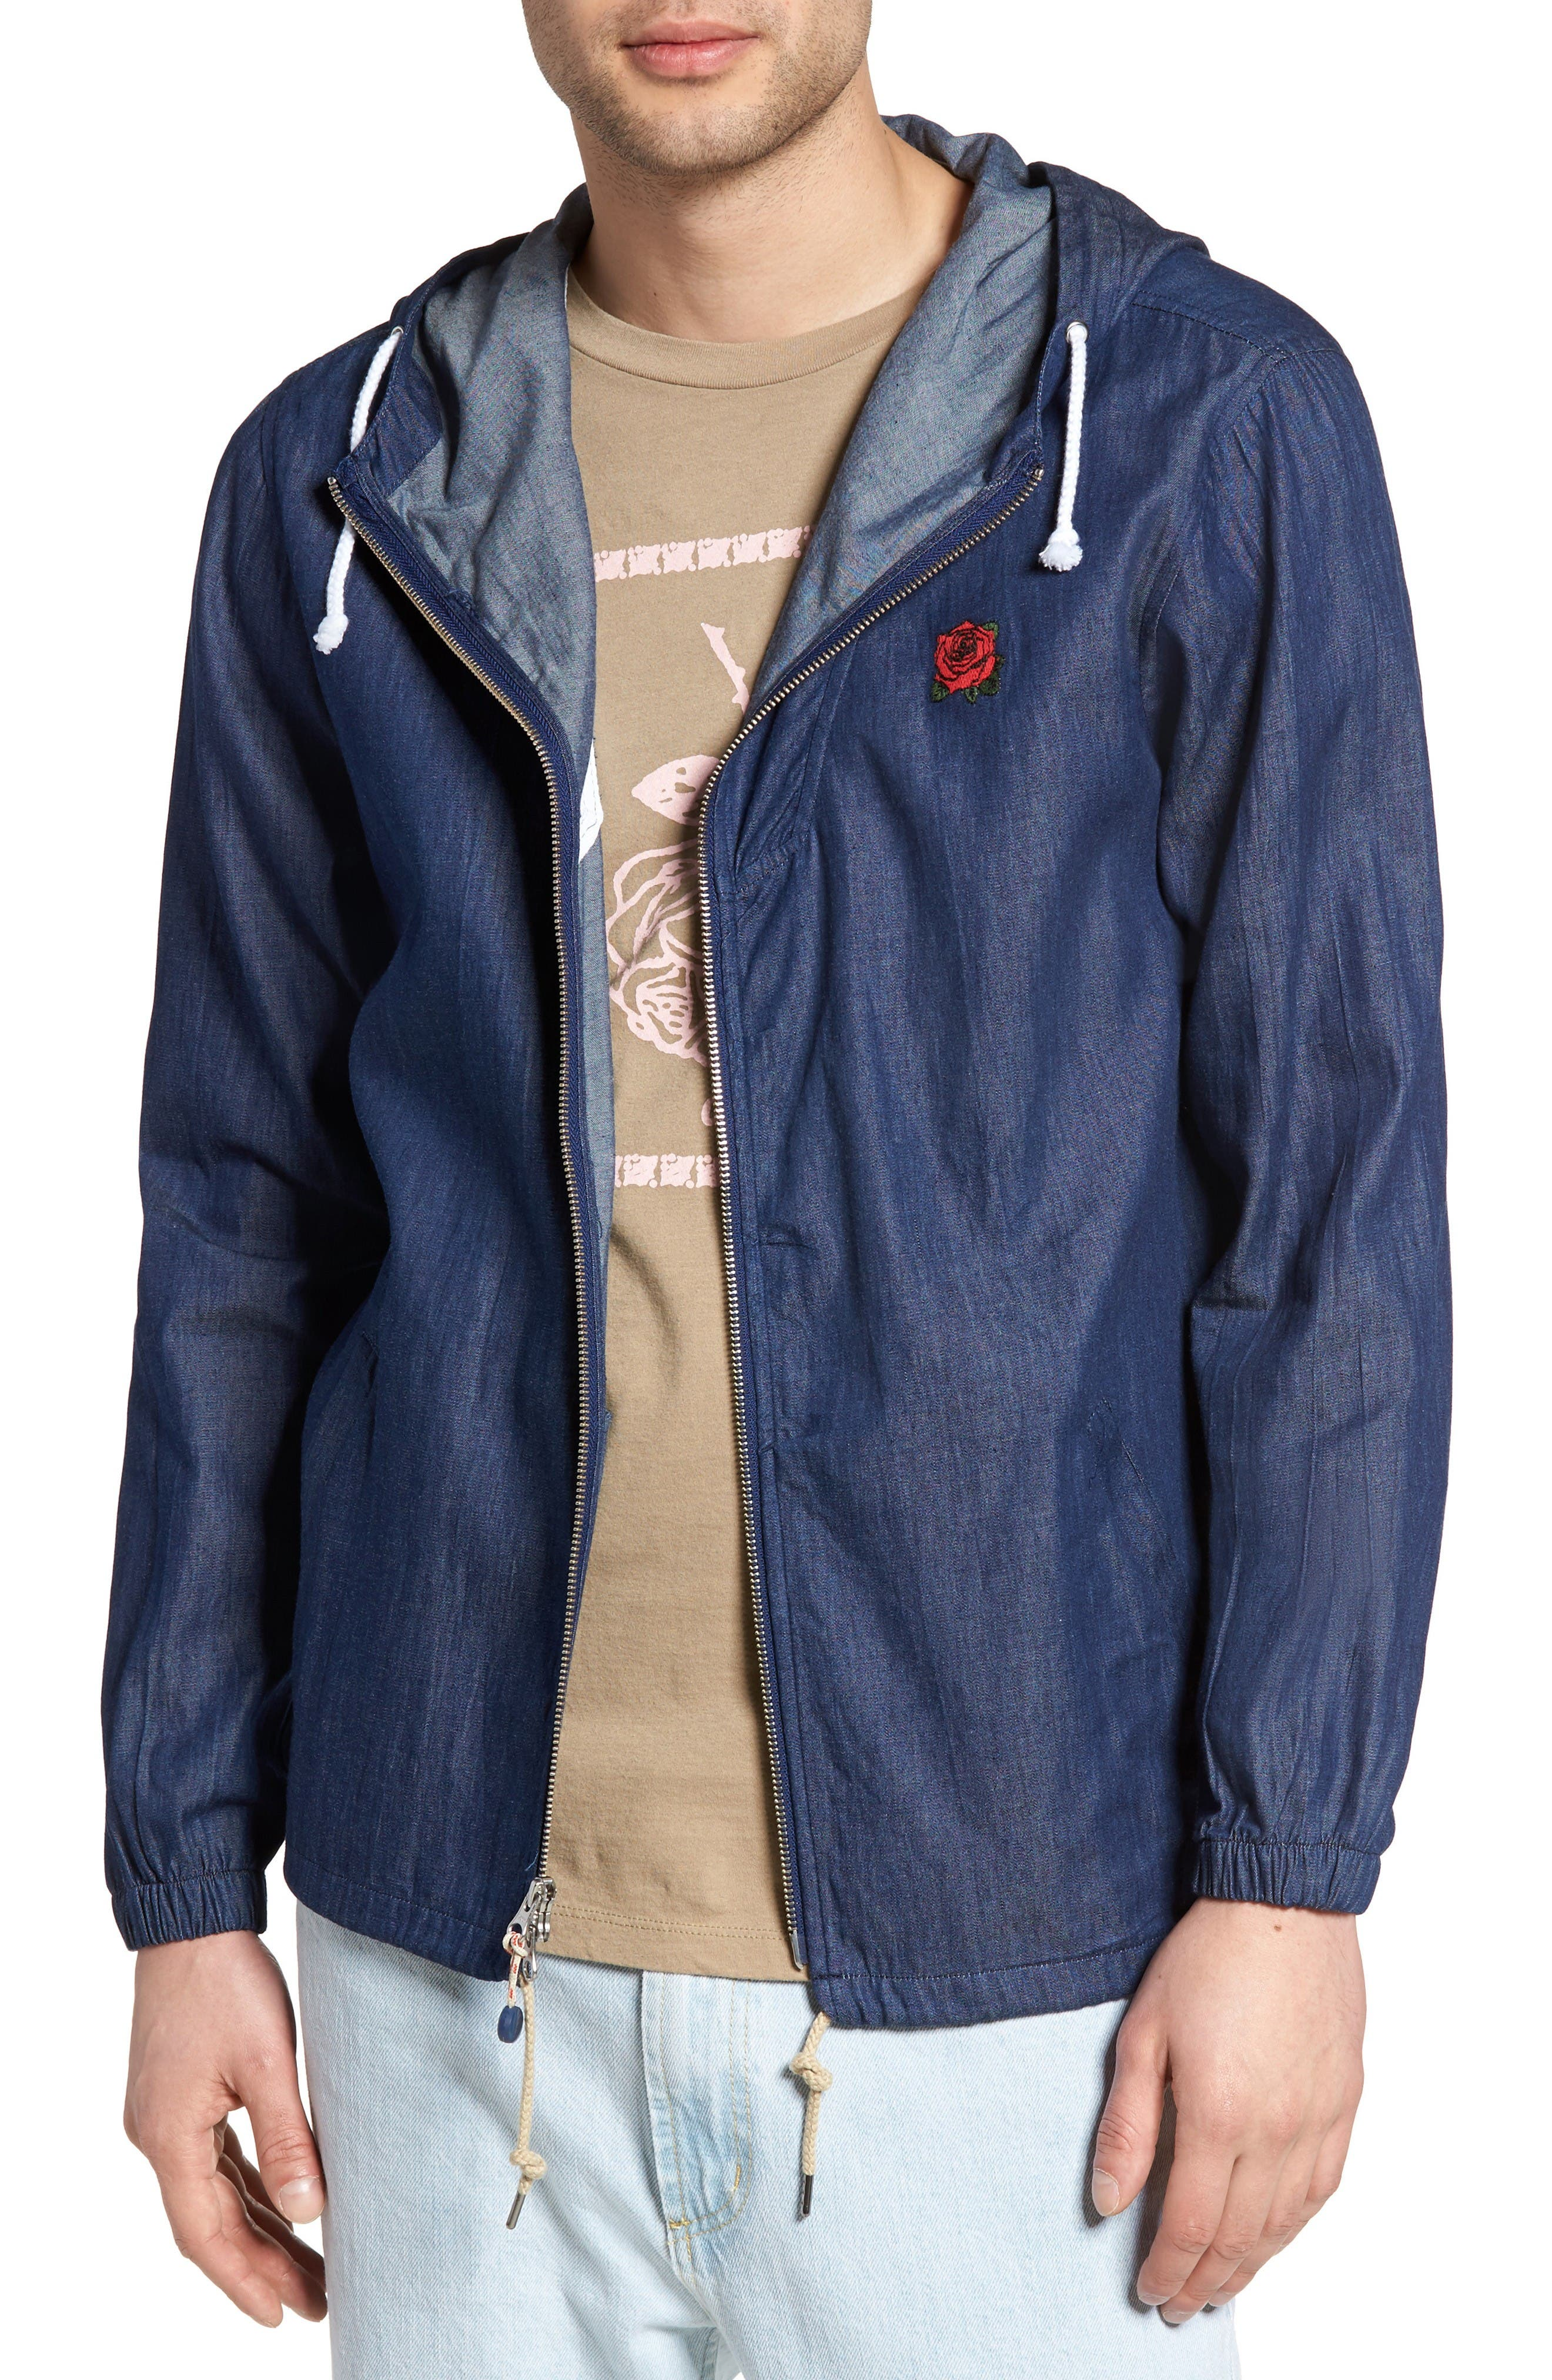 Main Image - Altru Flower District Hooded Zip Denim Jacket